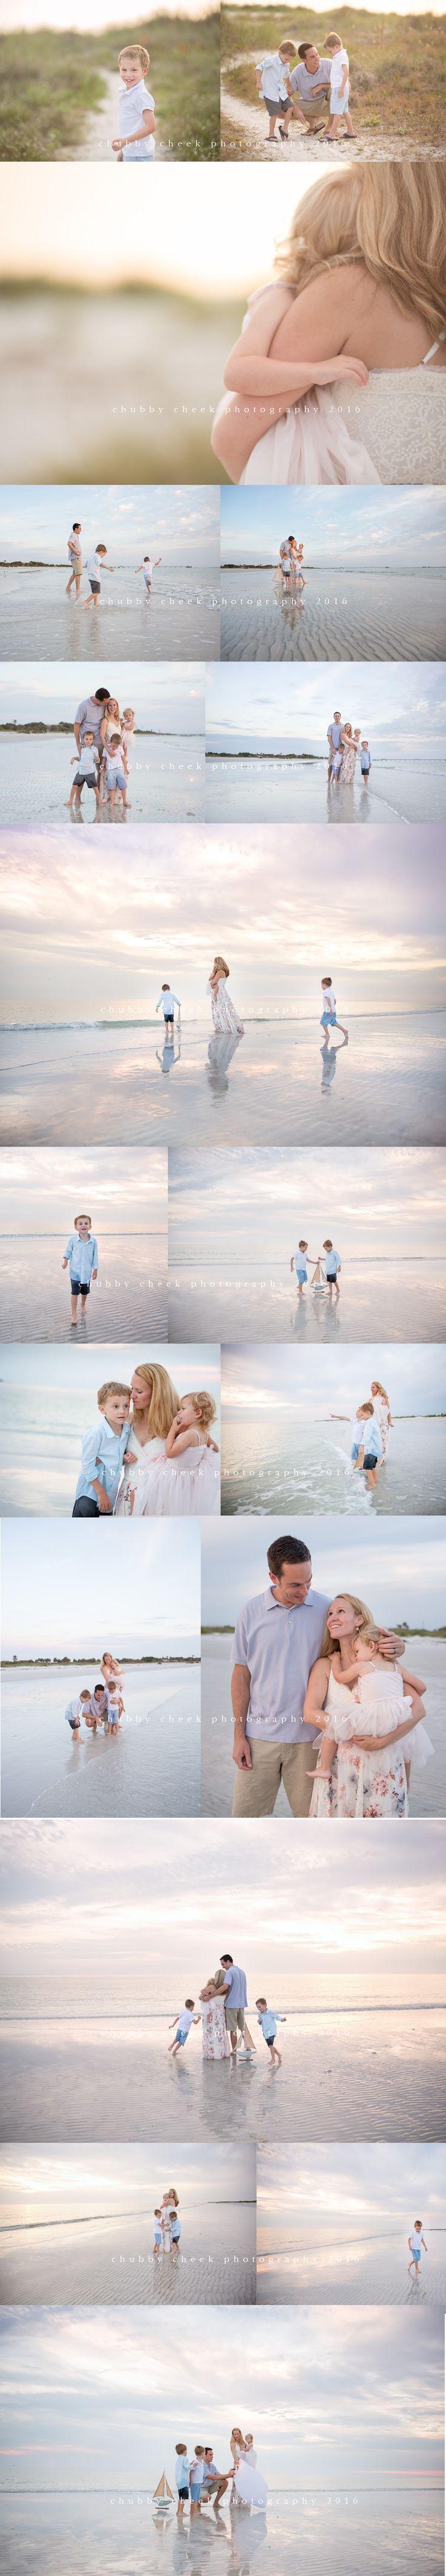 family beach photographer chubby  cheek photography                                                                                                                                                                                 More